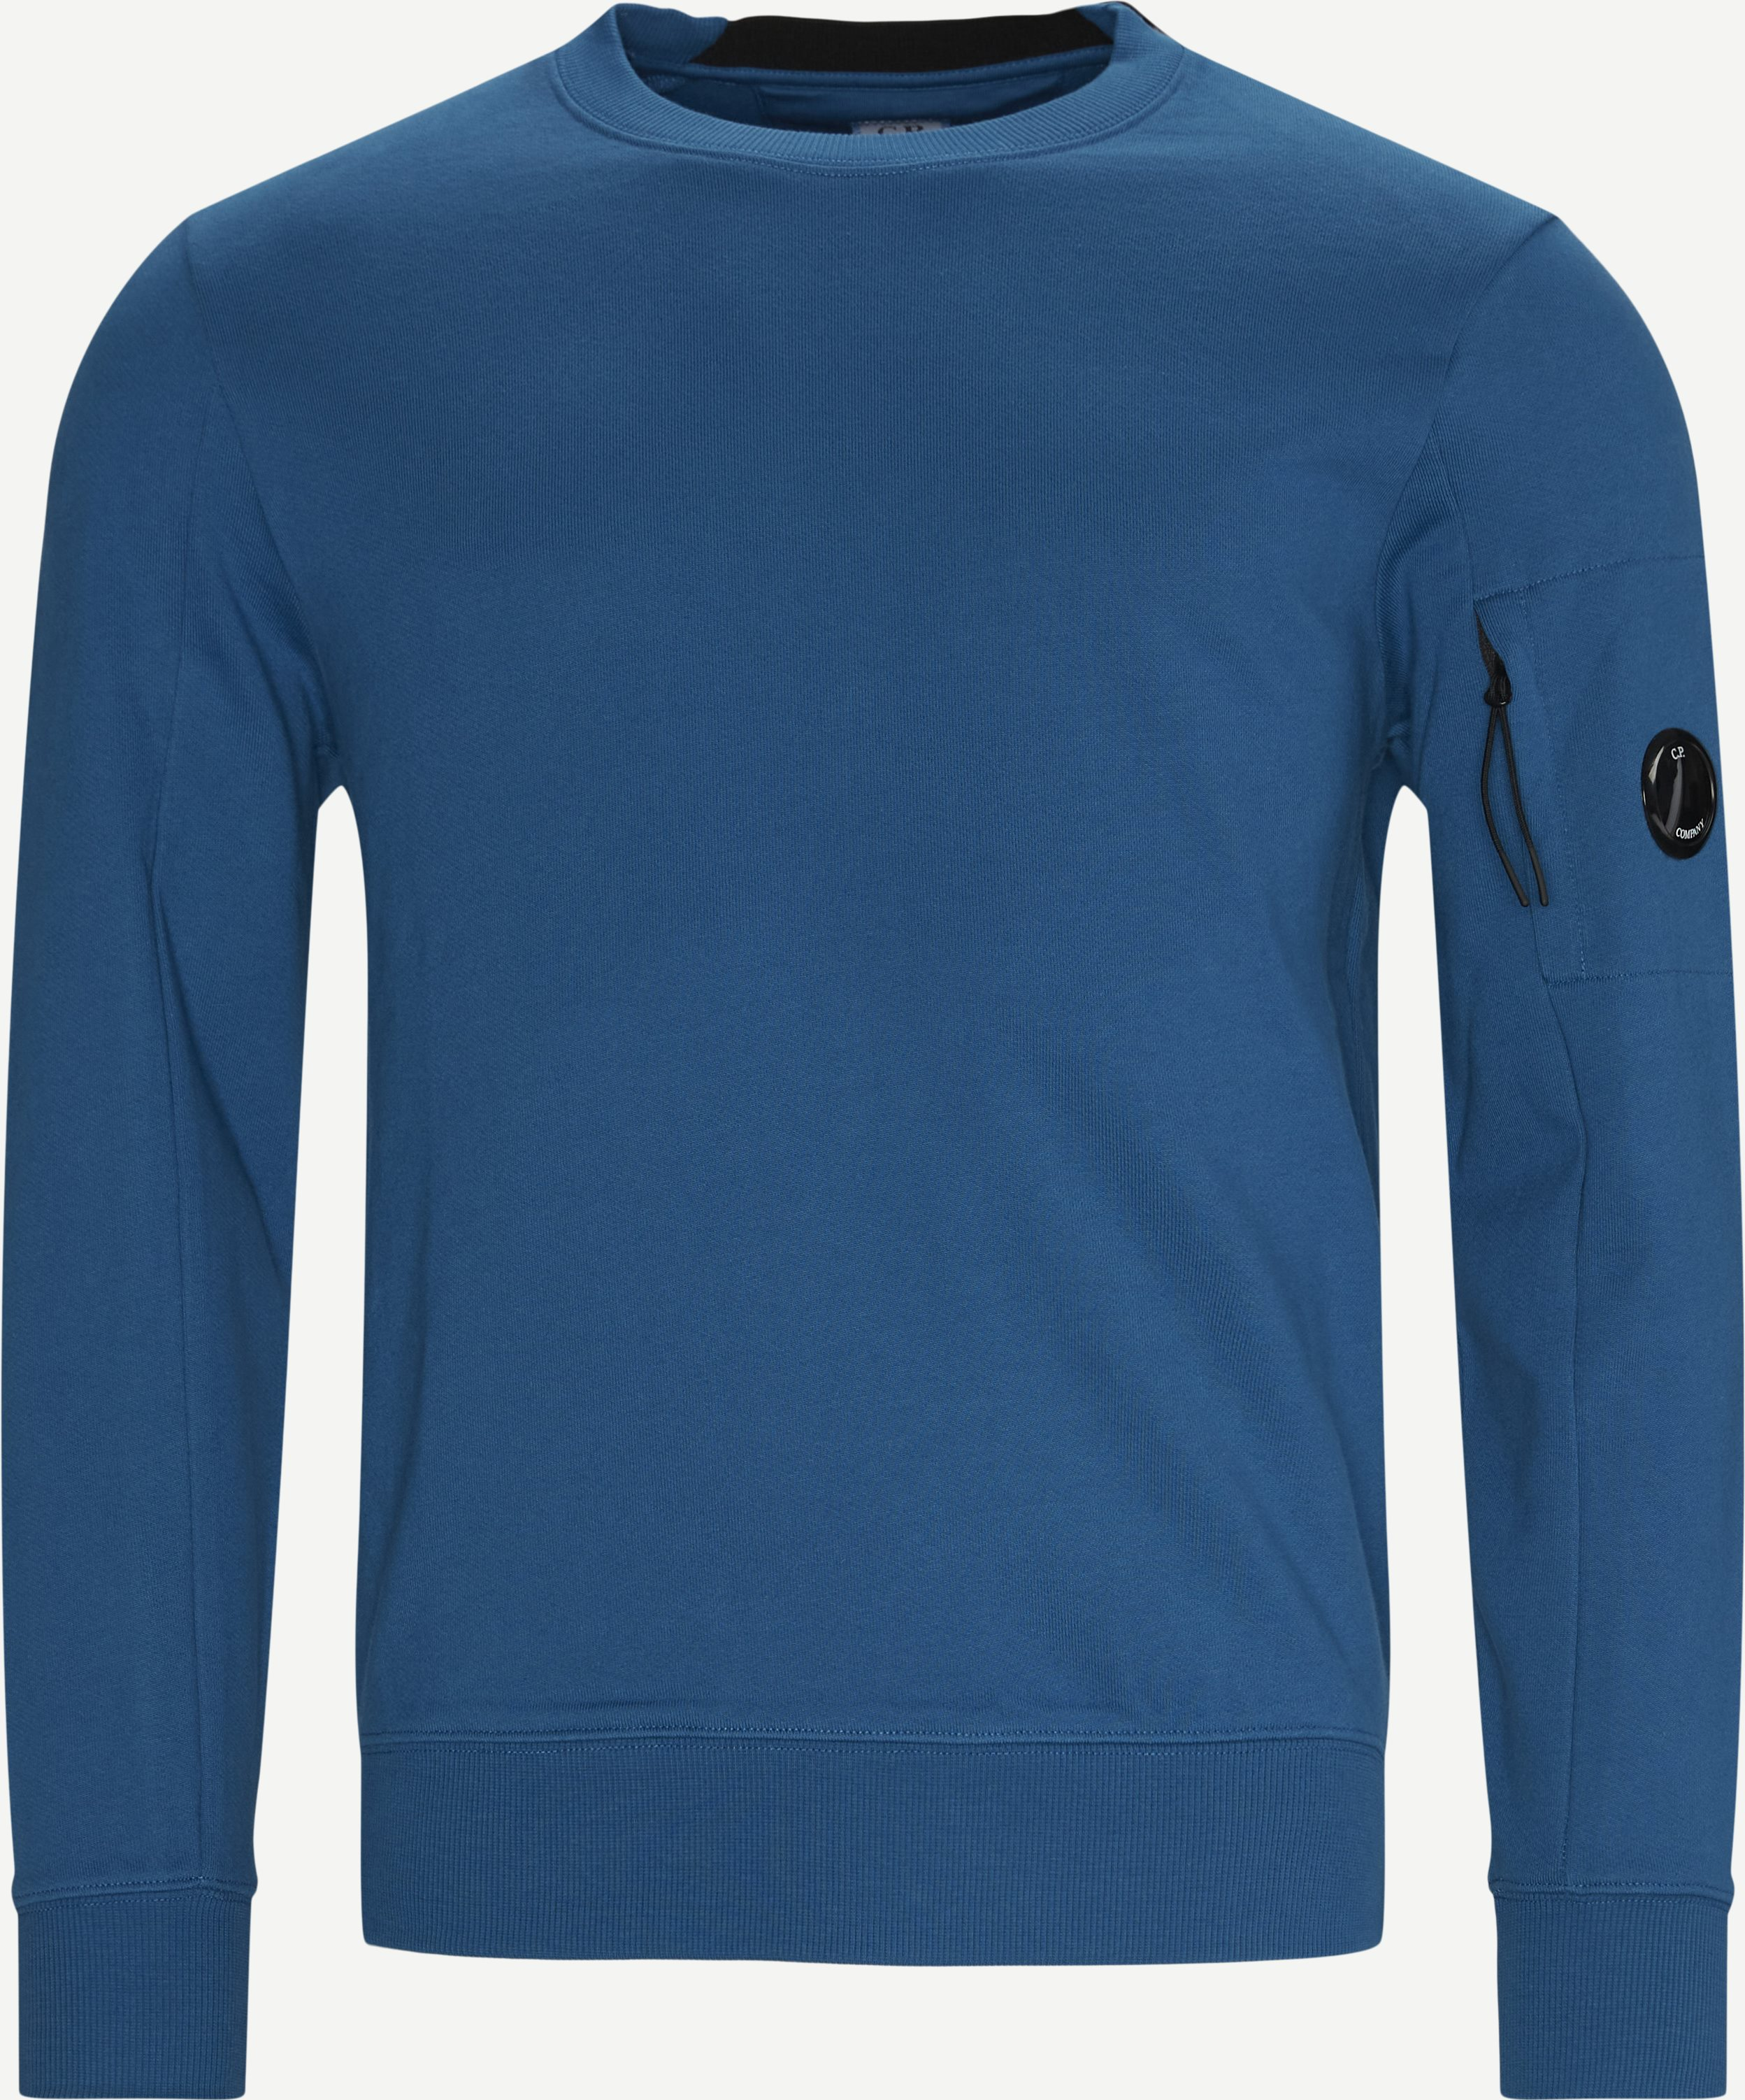 Sweatshirts - Regular fit - Blau